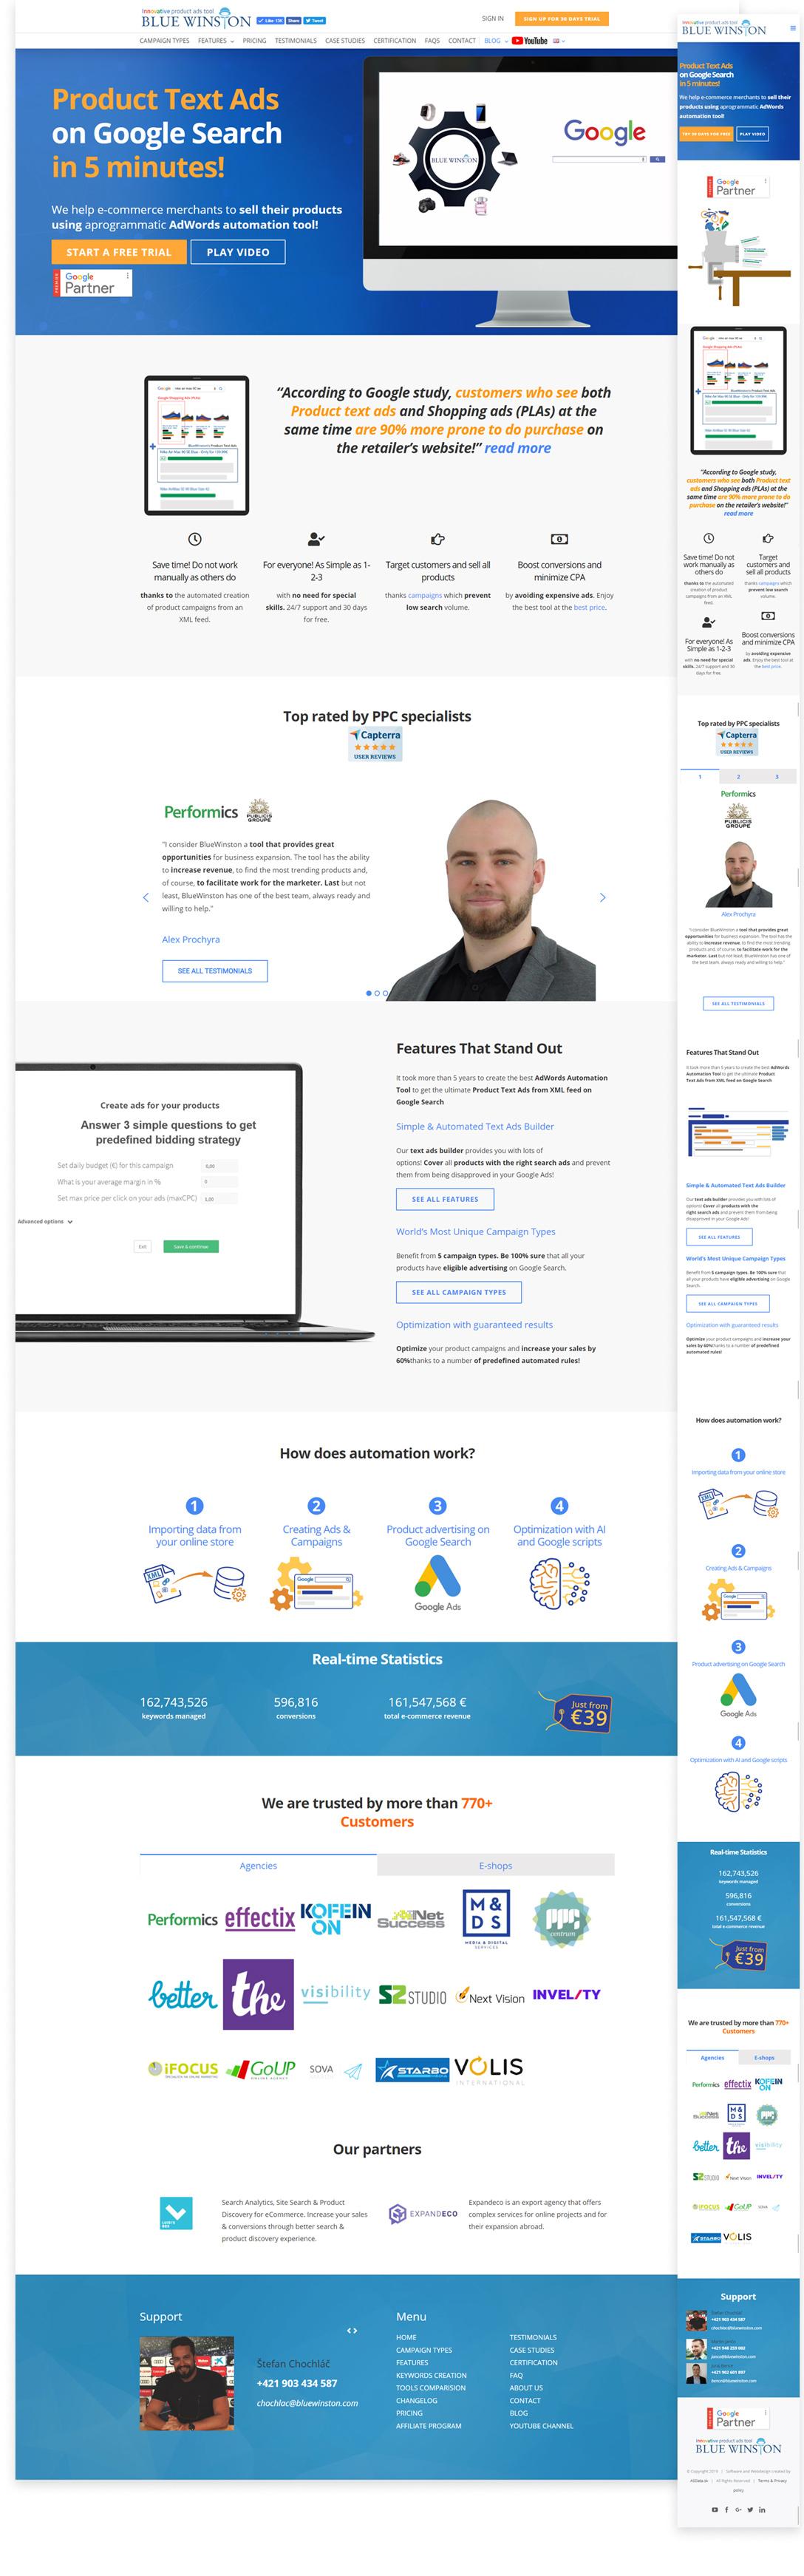 Fully responsive design for desktops, tablets and mobile phones